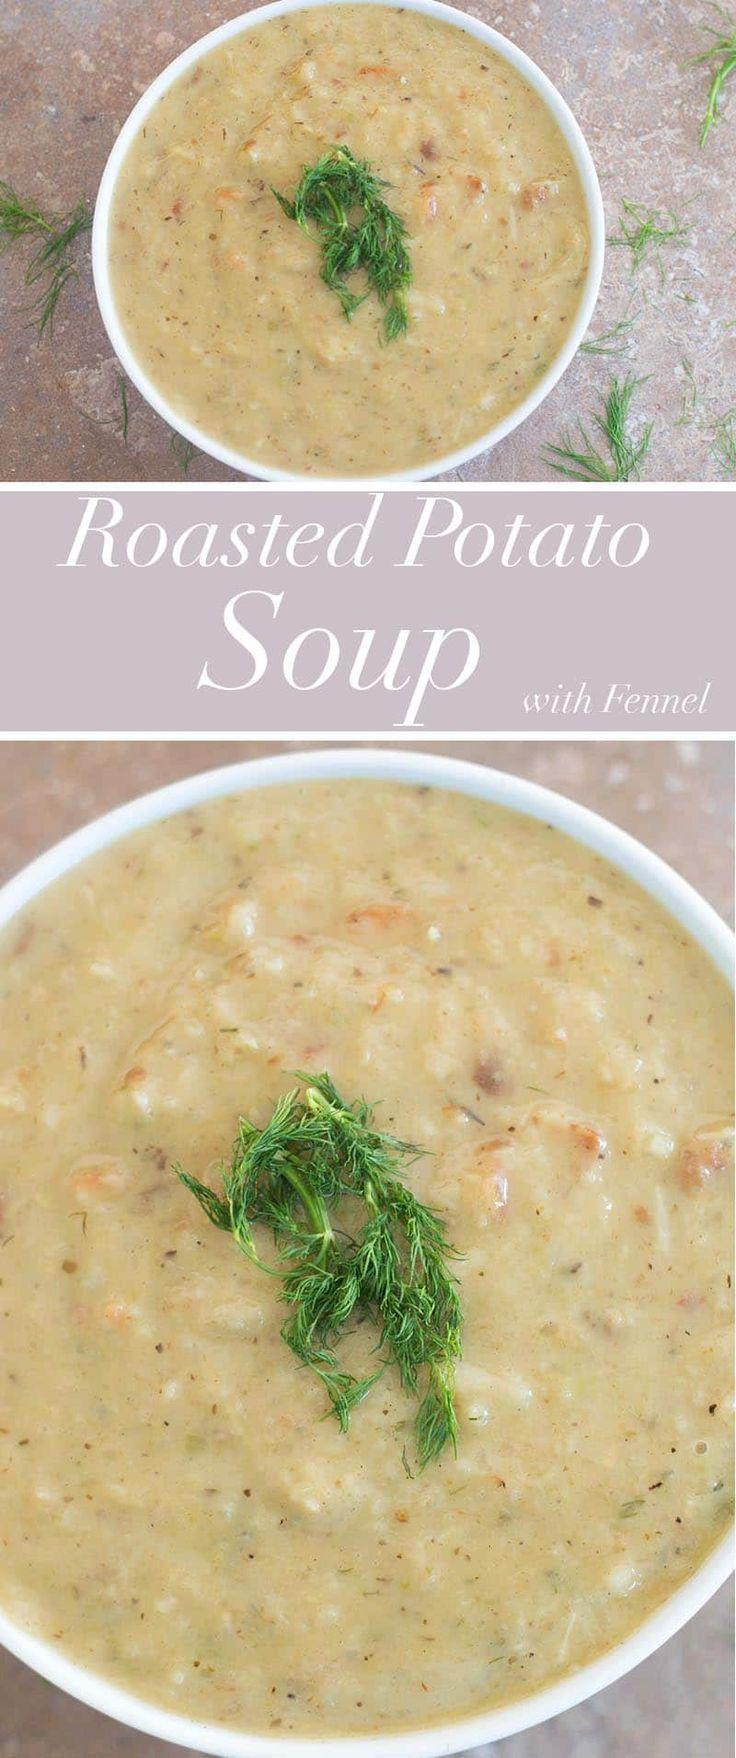 Vegan roasted potato soup with fennel & dill. It is an easy potato soup recipe made using cream of coconut. | #Vegan #vegetarian #comfortfood #soups #potato #stpatricksday #potato